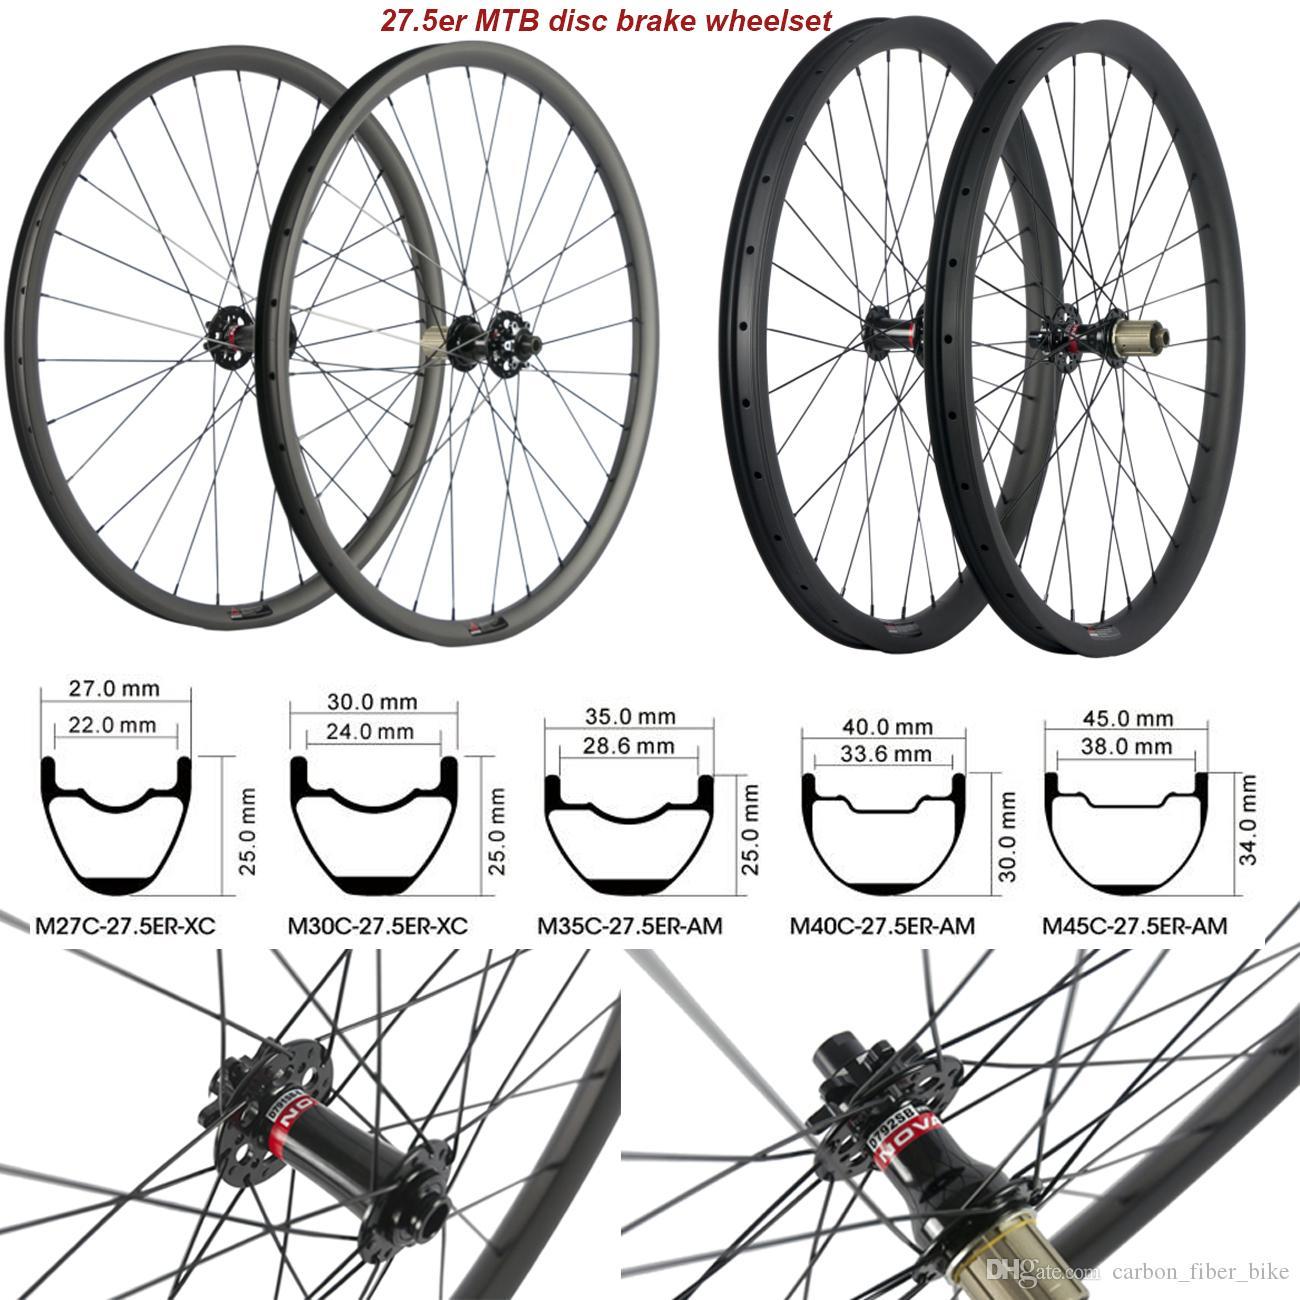 MTB الكربون العجلات 27.5ER 27/30 / 35/40 / 45mm ومع جبل عجلات Novatec محور 791-792 مركزا 6 الترباس UD ماتي الكربون عجلات